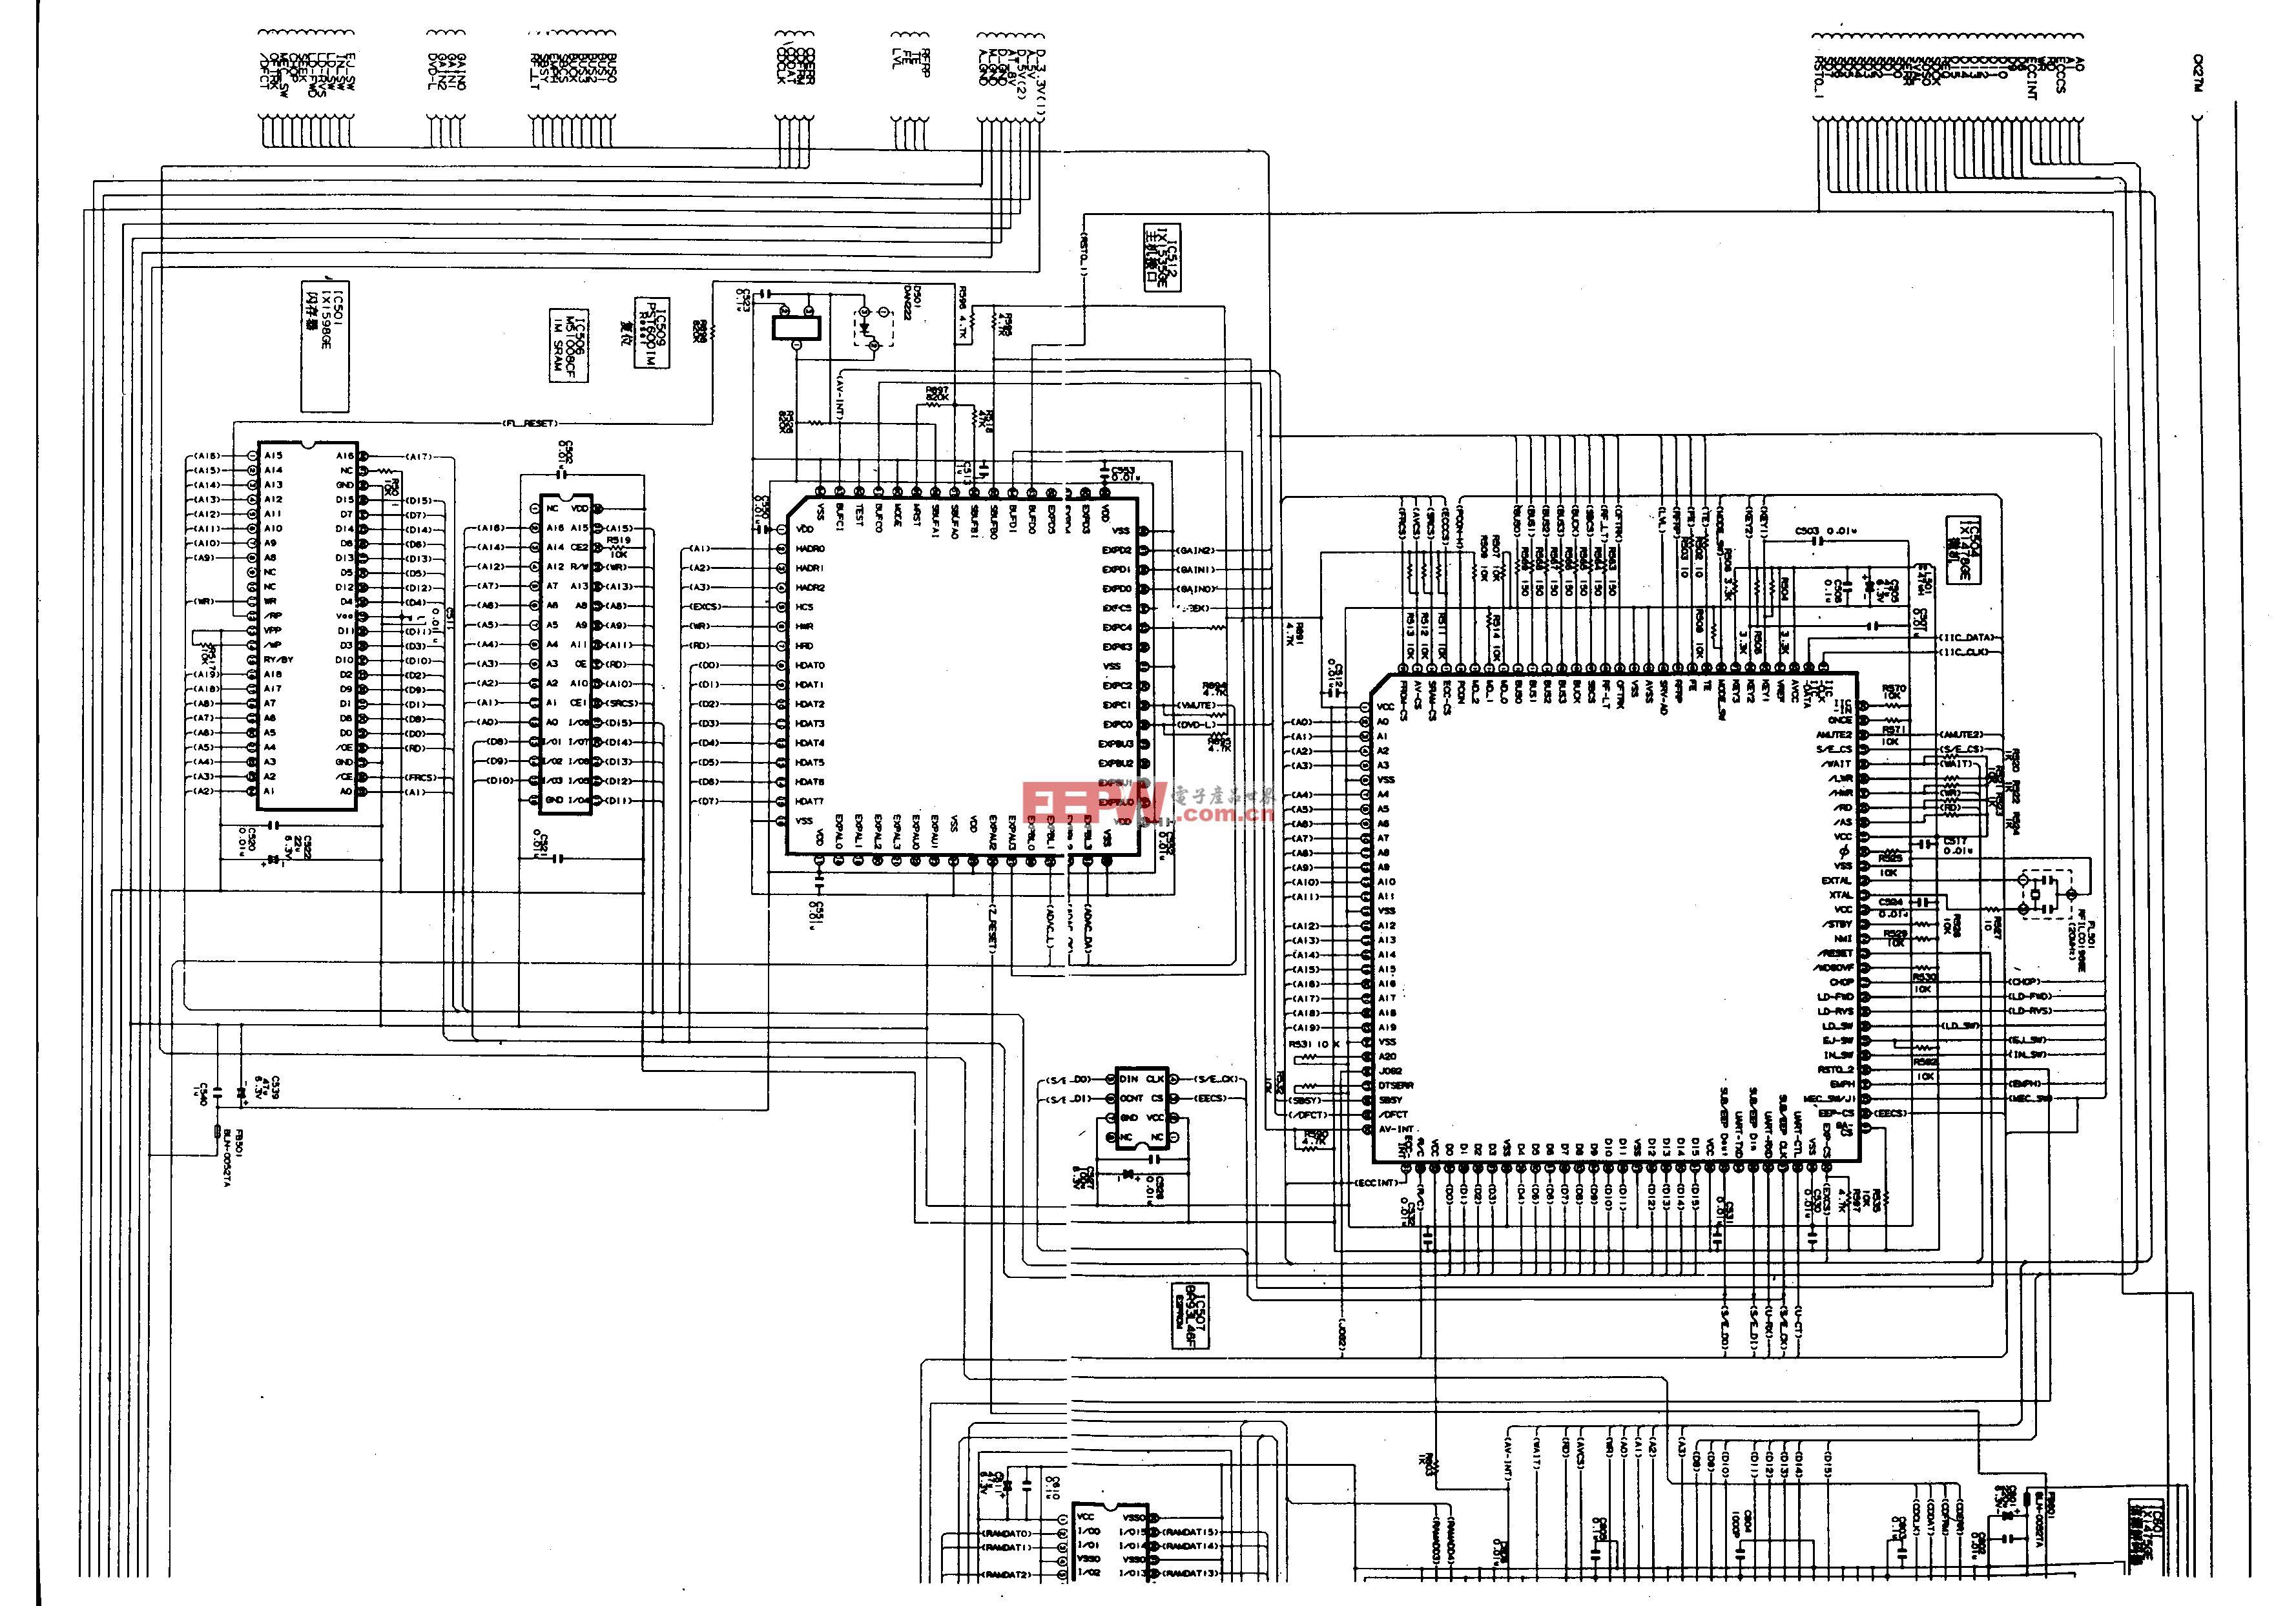 SHARP DV-600U、DV-650U型DVD-主电路图2A